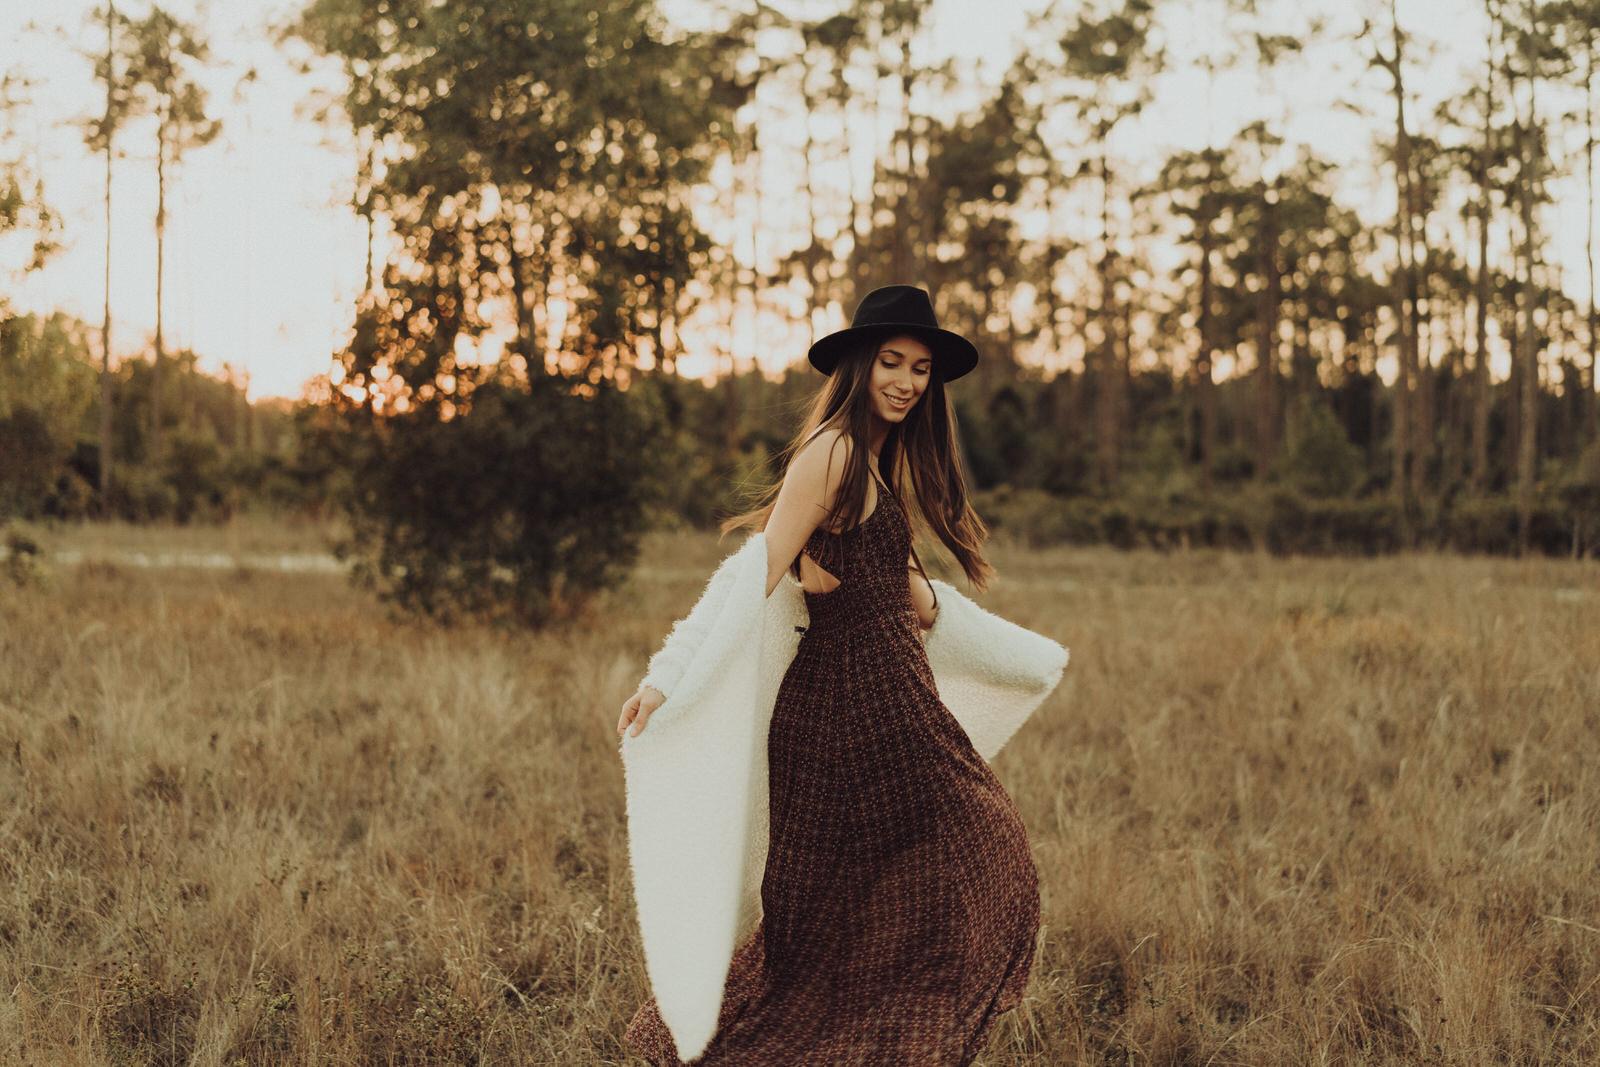 Naples Florida Senior pictures-Boho Styled Shoot-Alisha-76.jpg